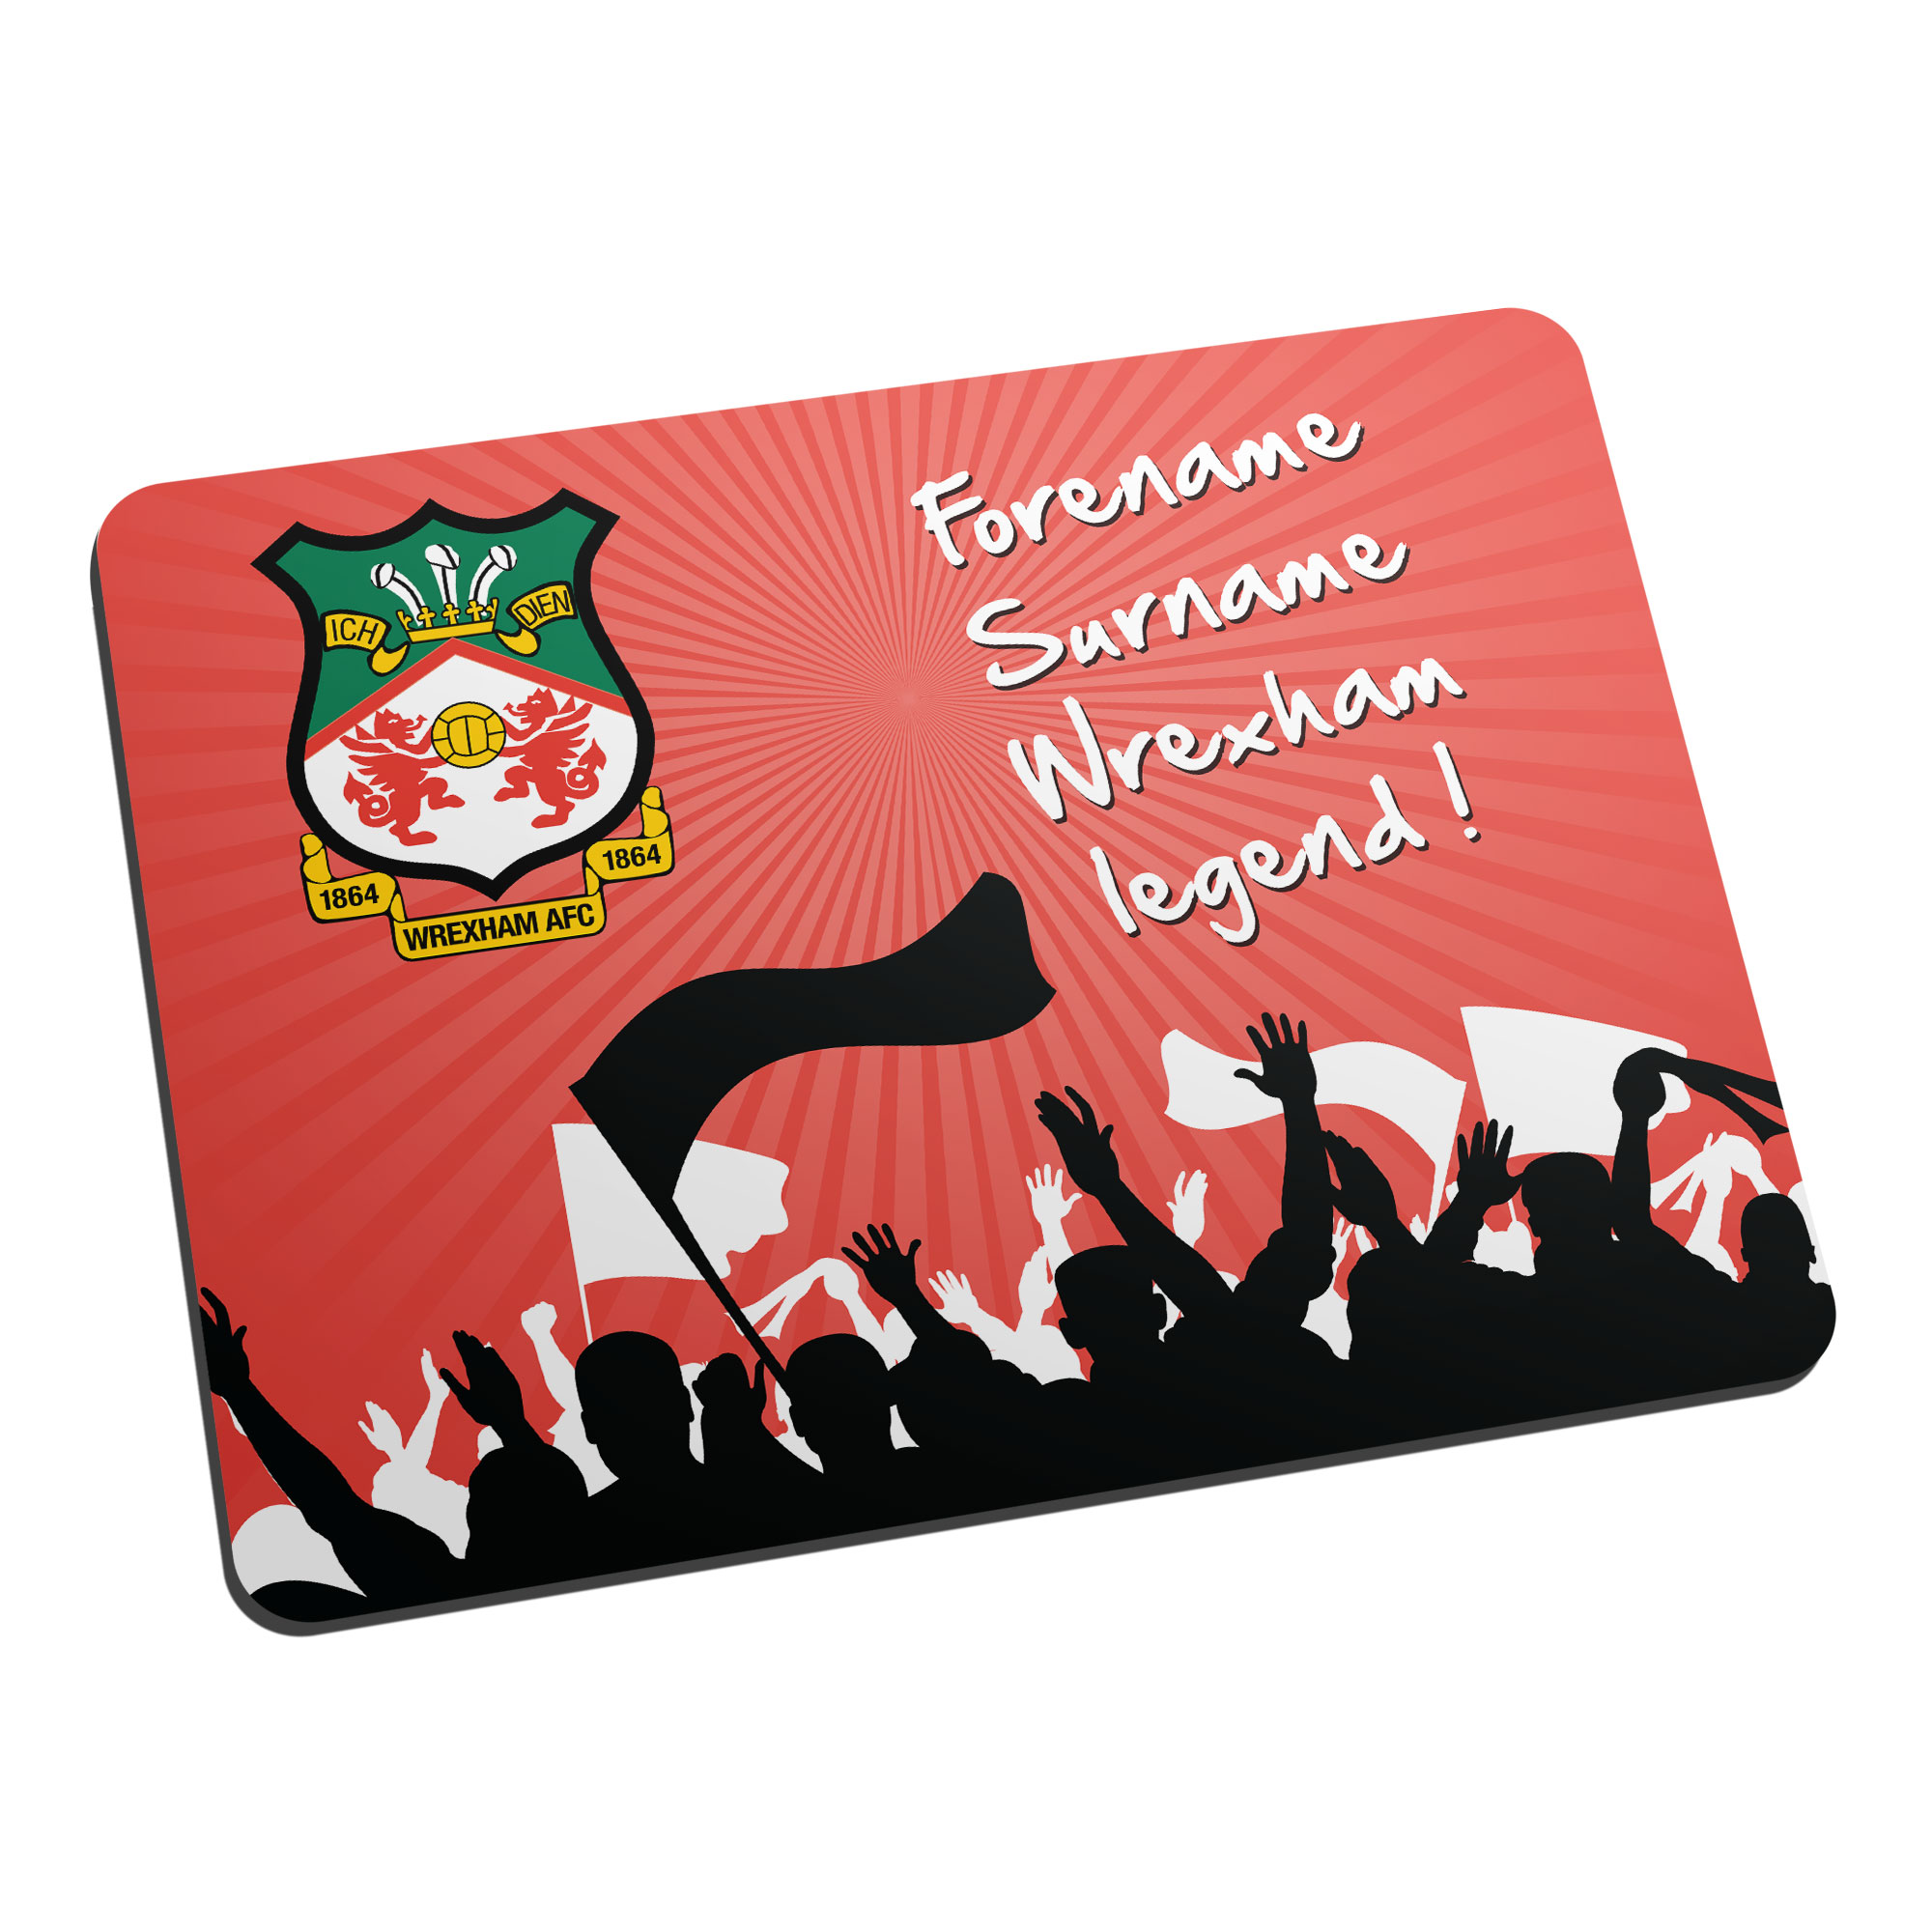 Wrexham AFC Legend Mouse Mat